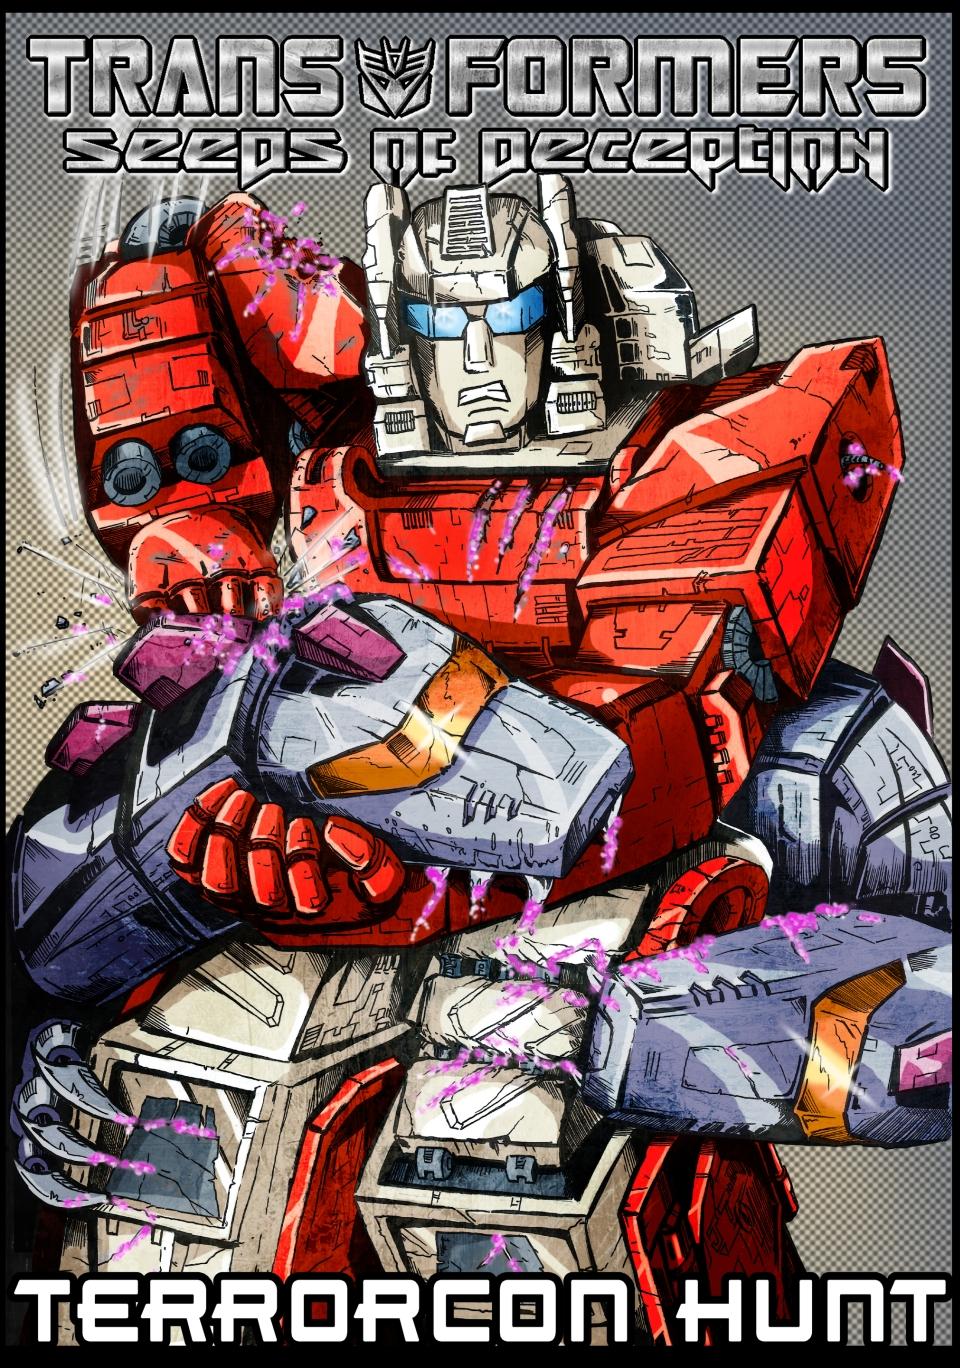 G1 Style Hun-Grrr versus Scattershot